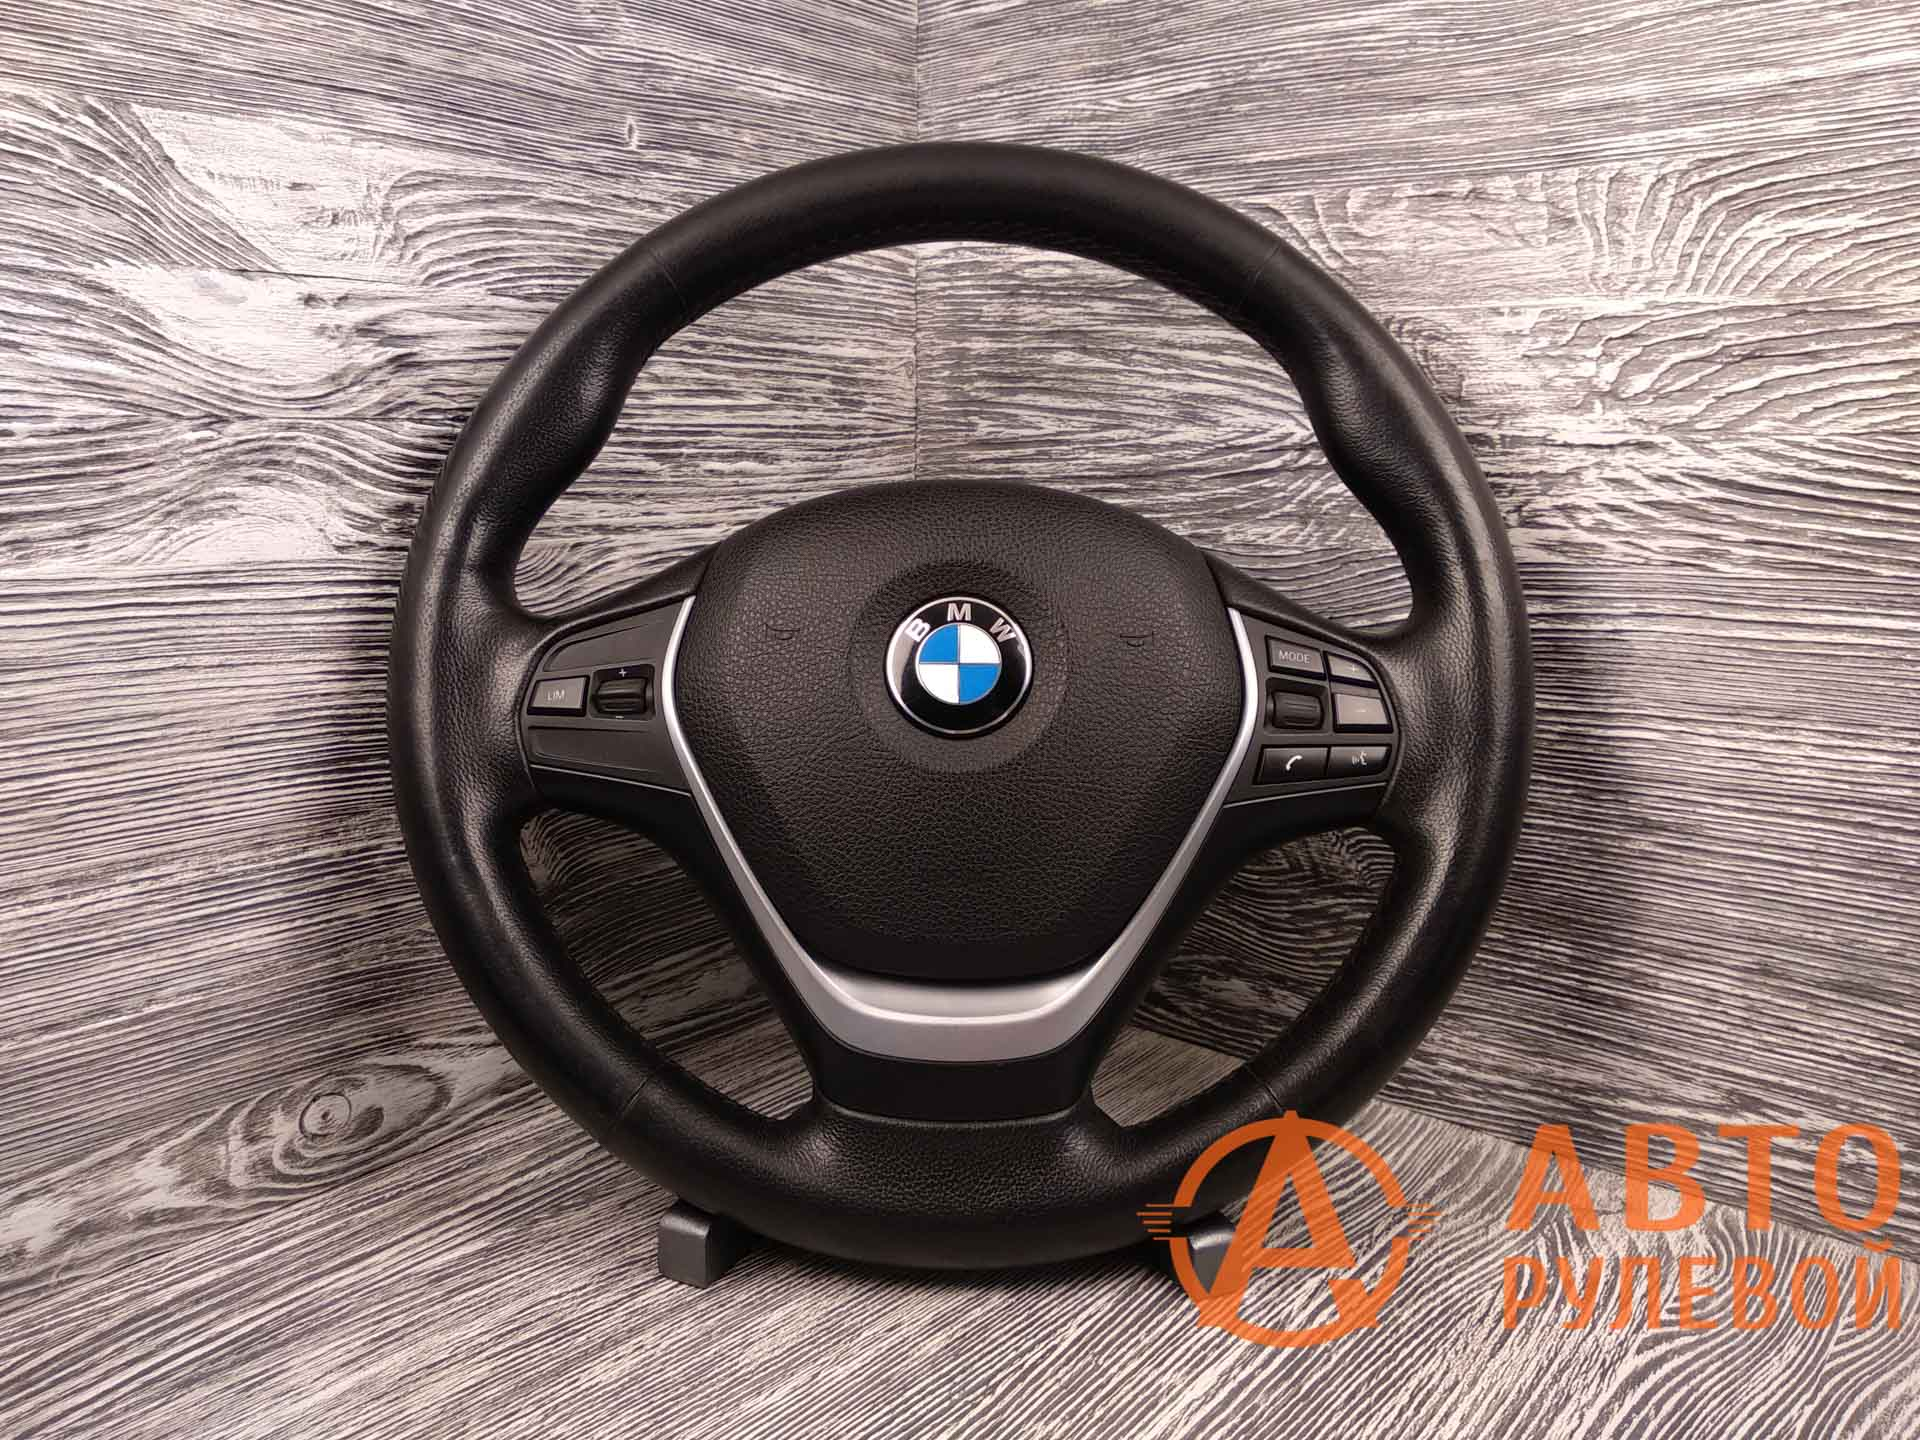 Руль BMW 1-Series 2 поколение (F20) 2011 до перетяжки